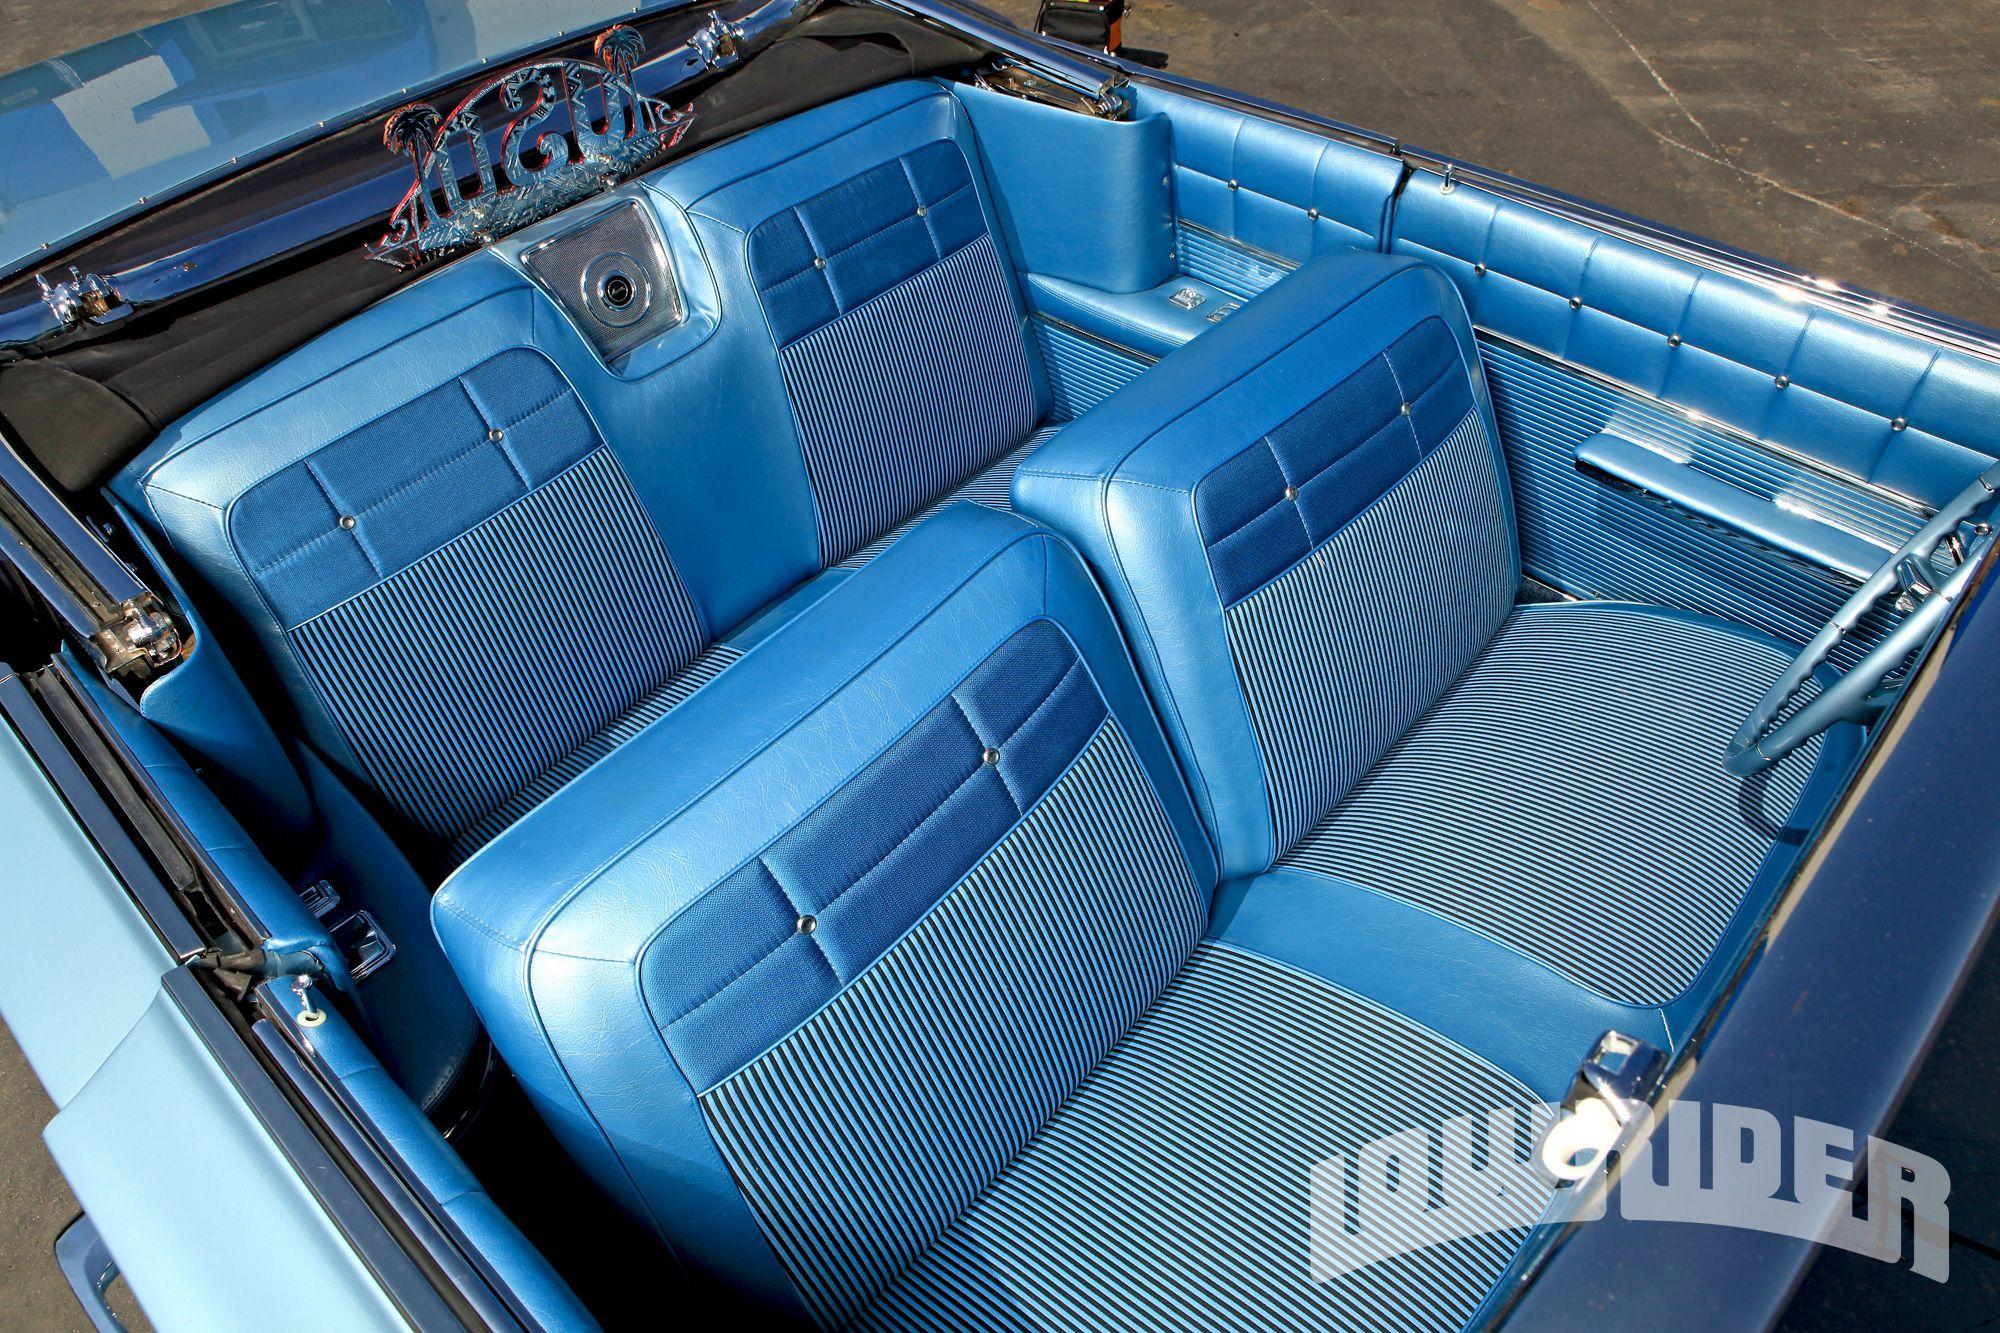 1962 Impala Convertible Upholstery Car Interior Car Seats Impala